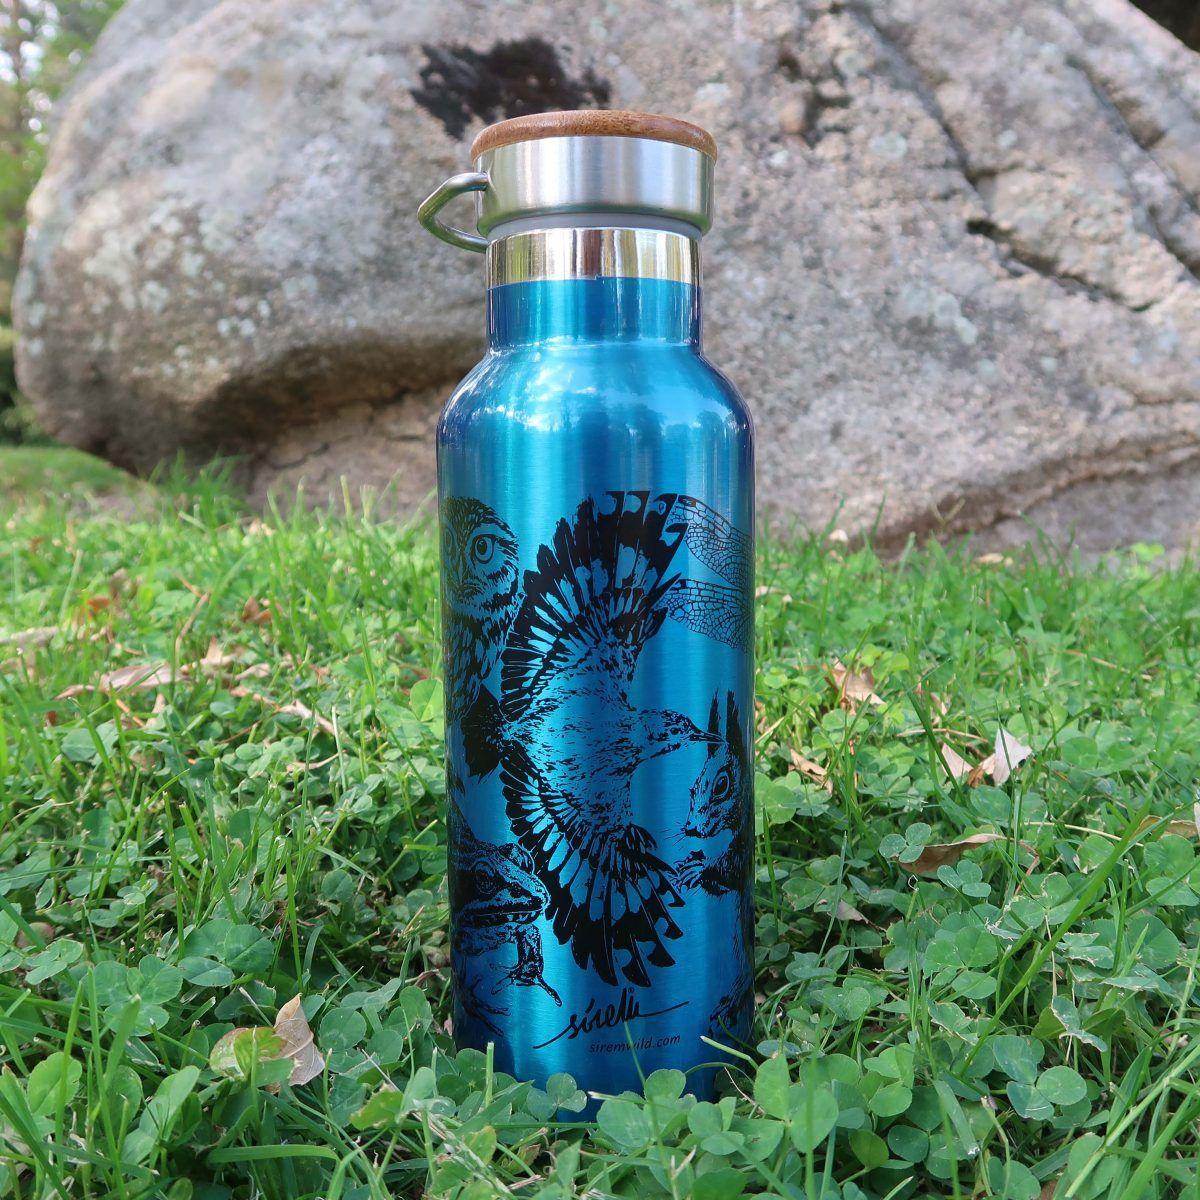 botellas de agua reutilizables-sirem wild-azul